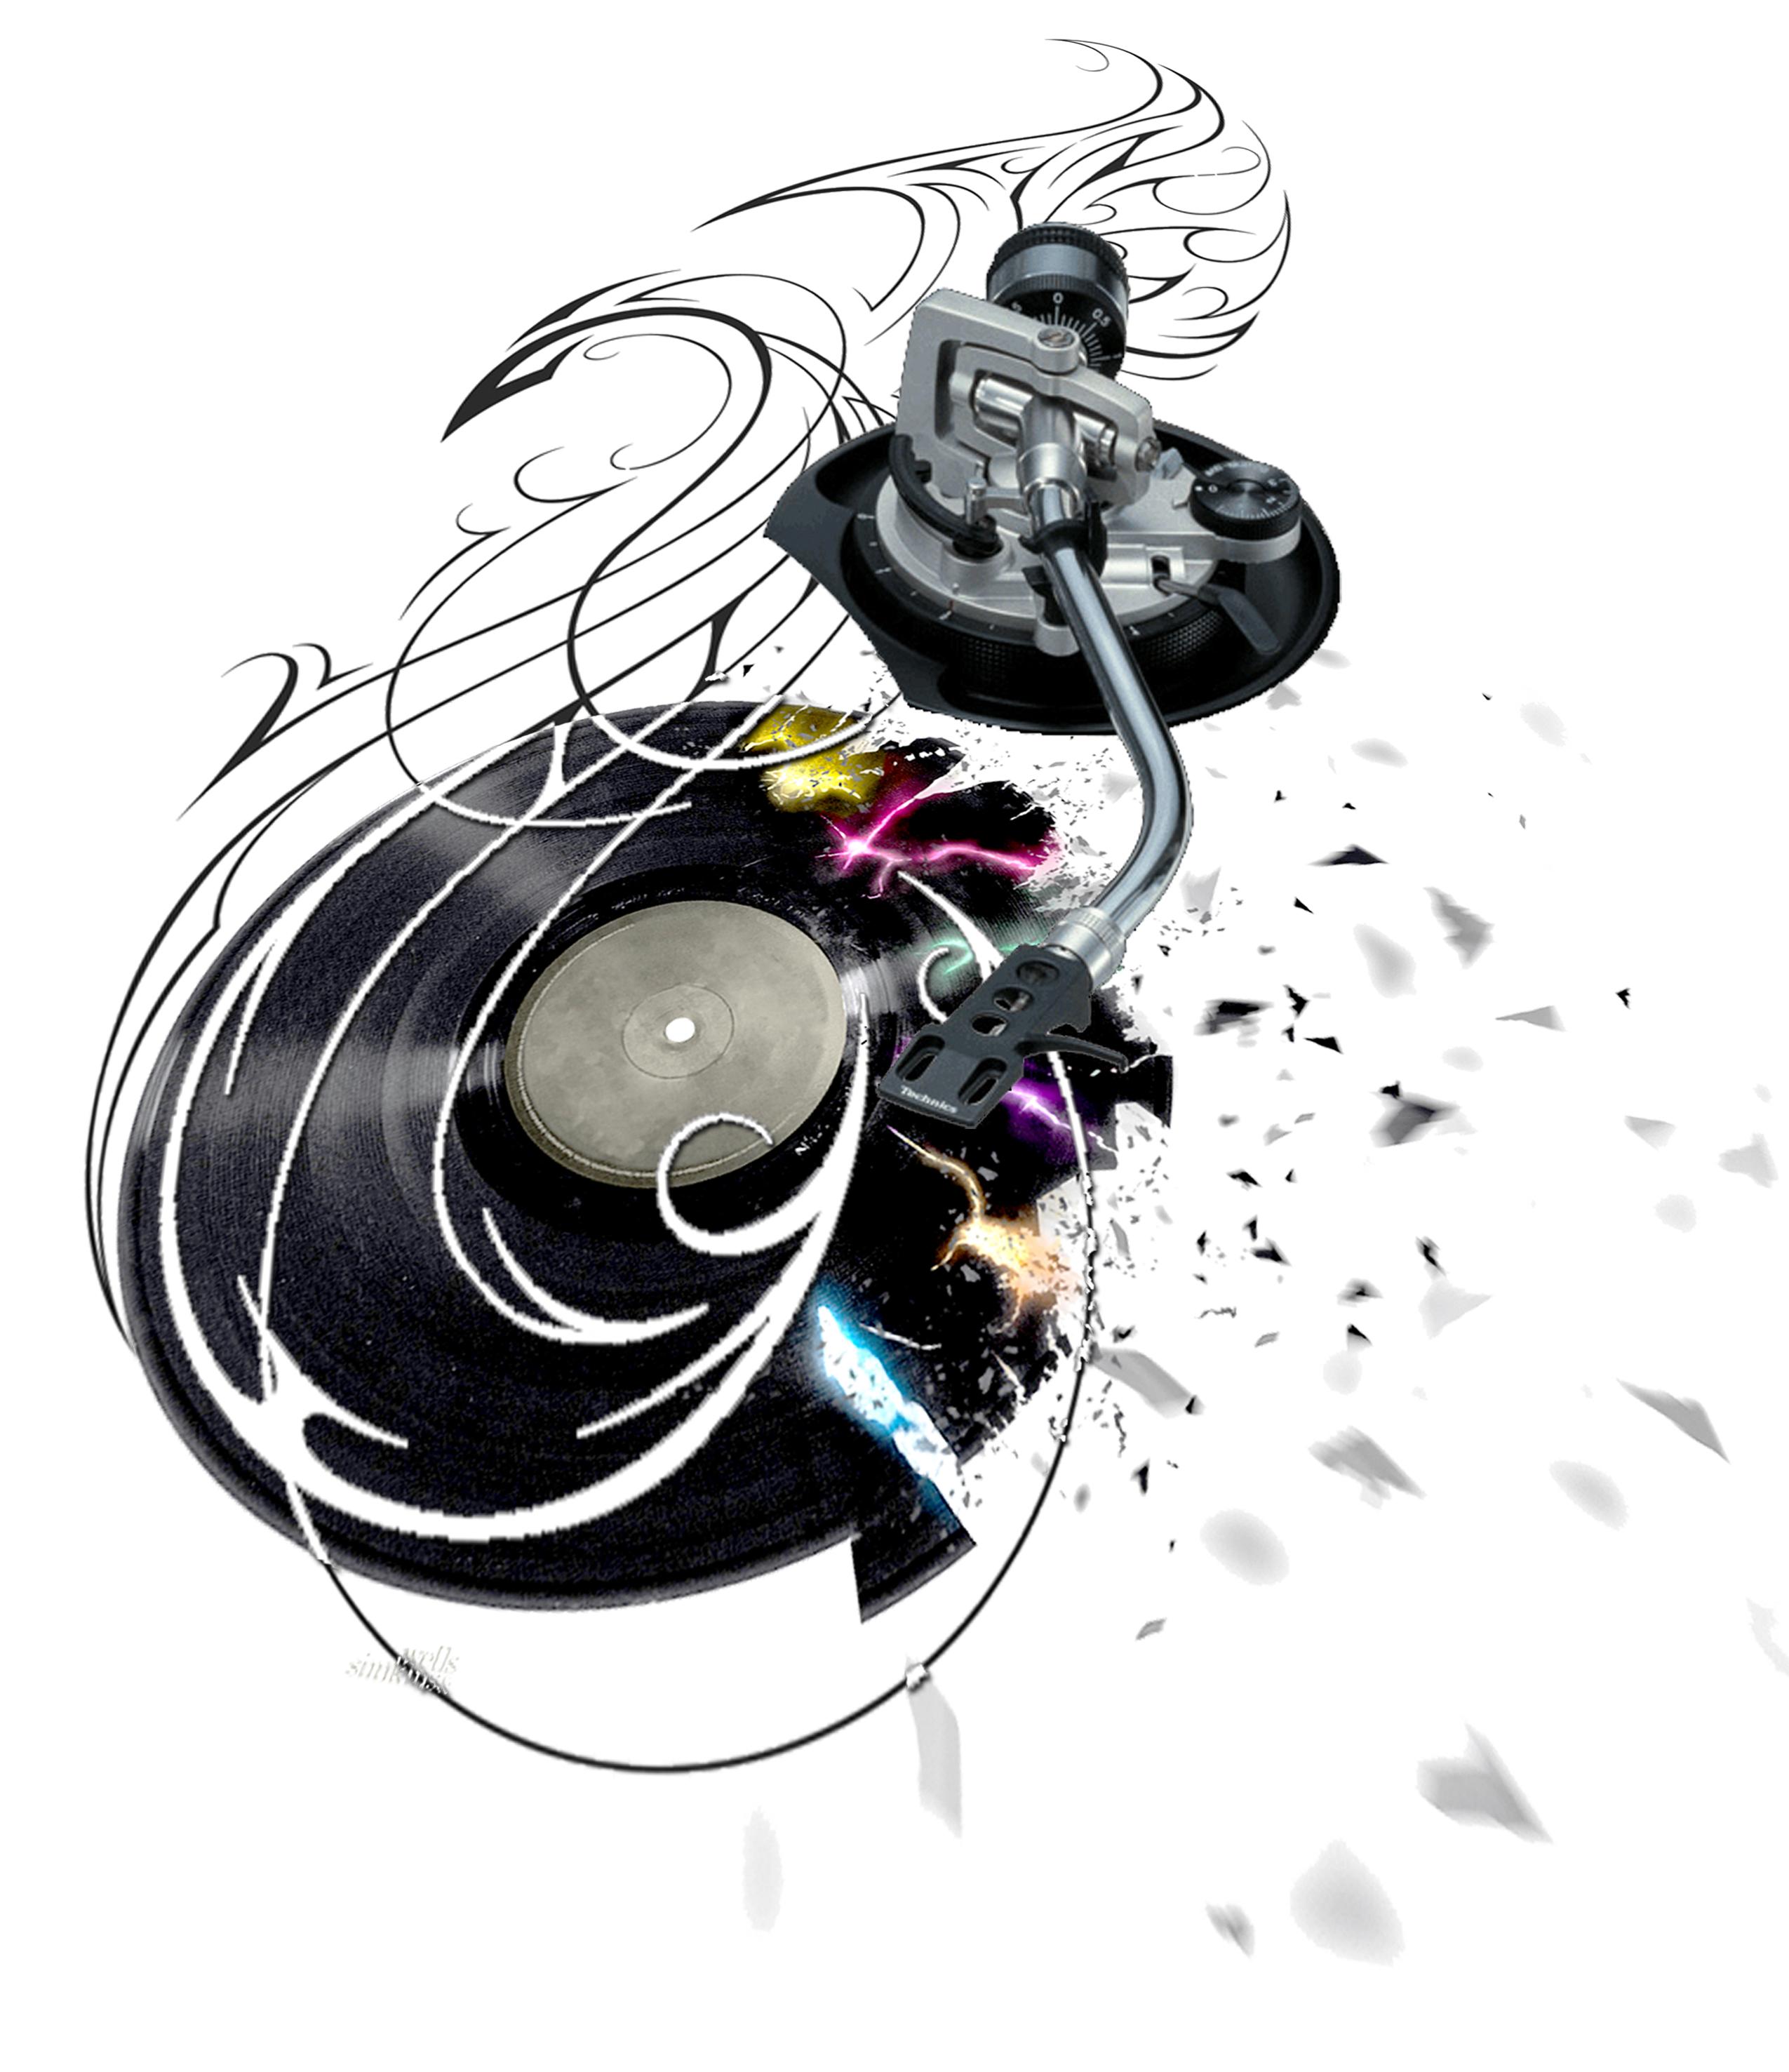 Drawn music dj speaker Headphones Headphones Tattoo Dj Mixer